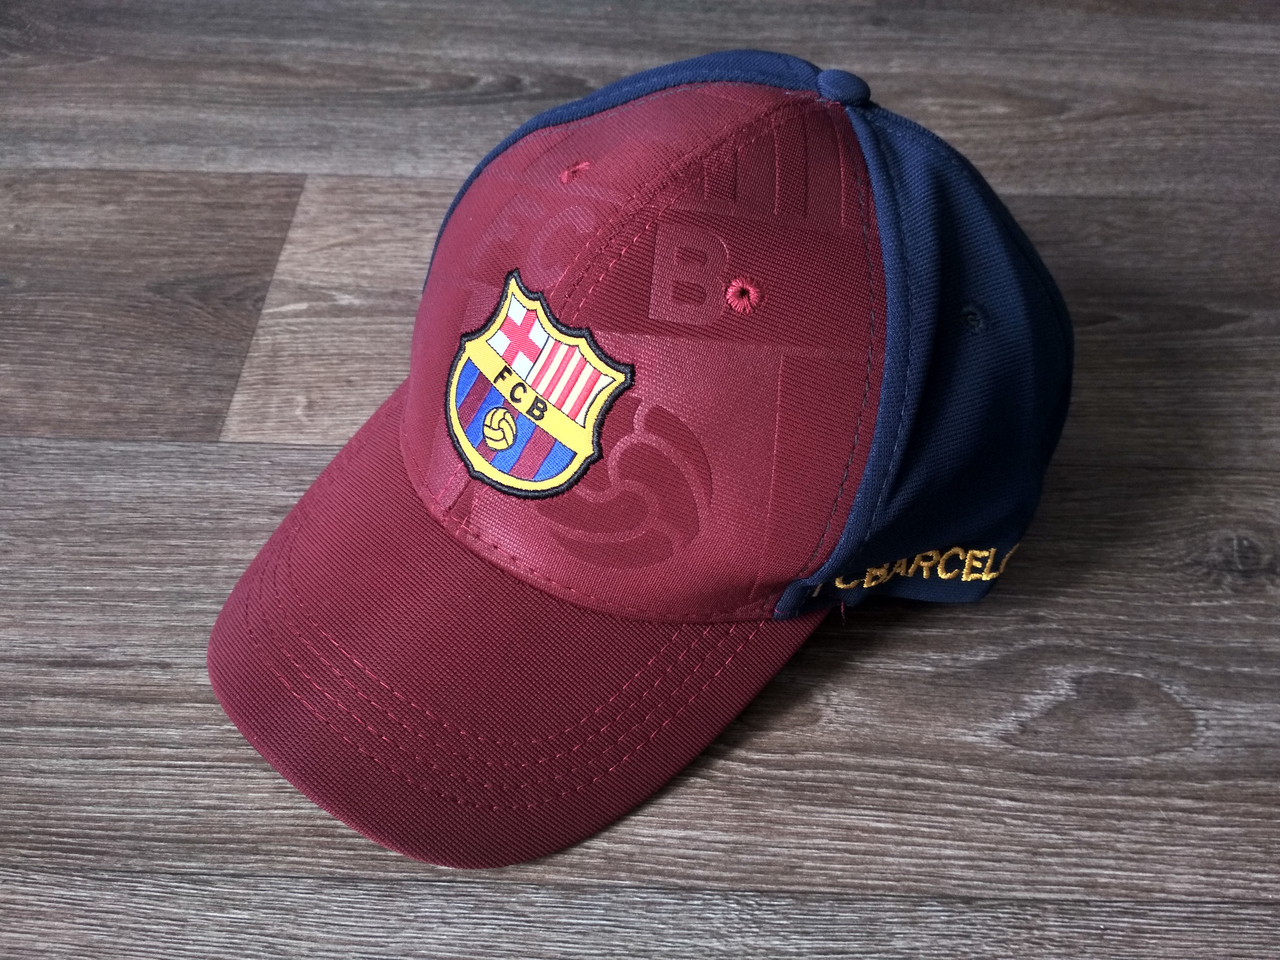 Футбольна Бейсболка / кепка Барселона / Barcelona бордова 19-20